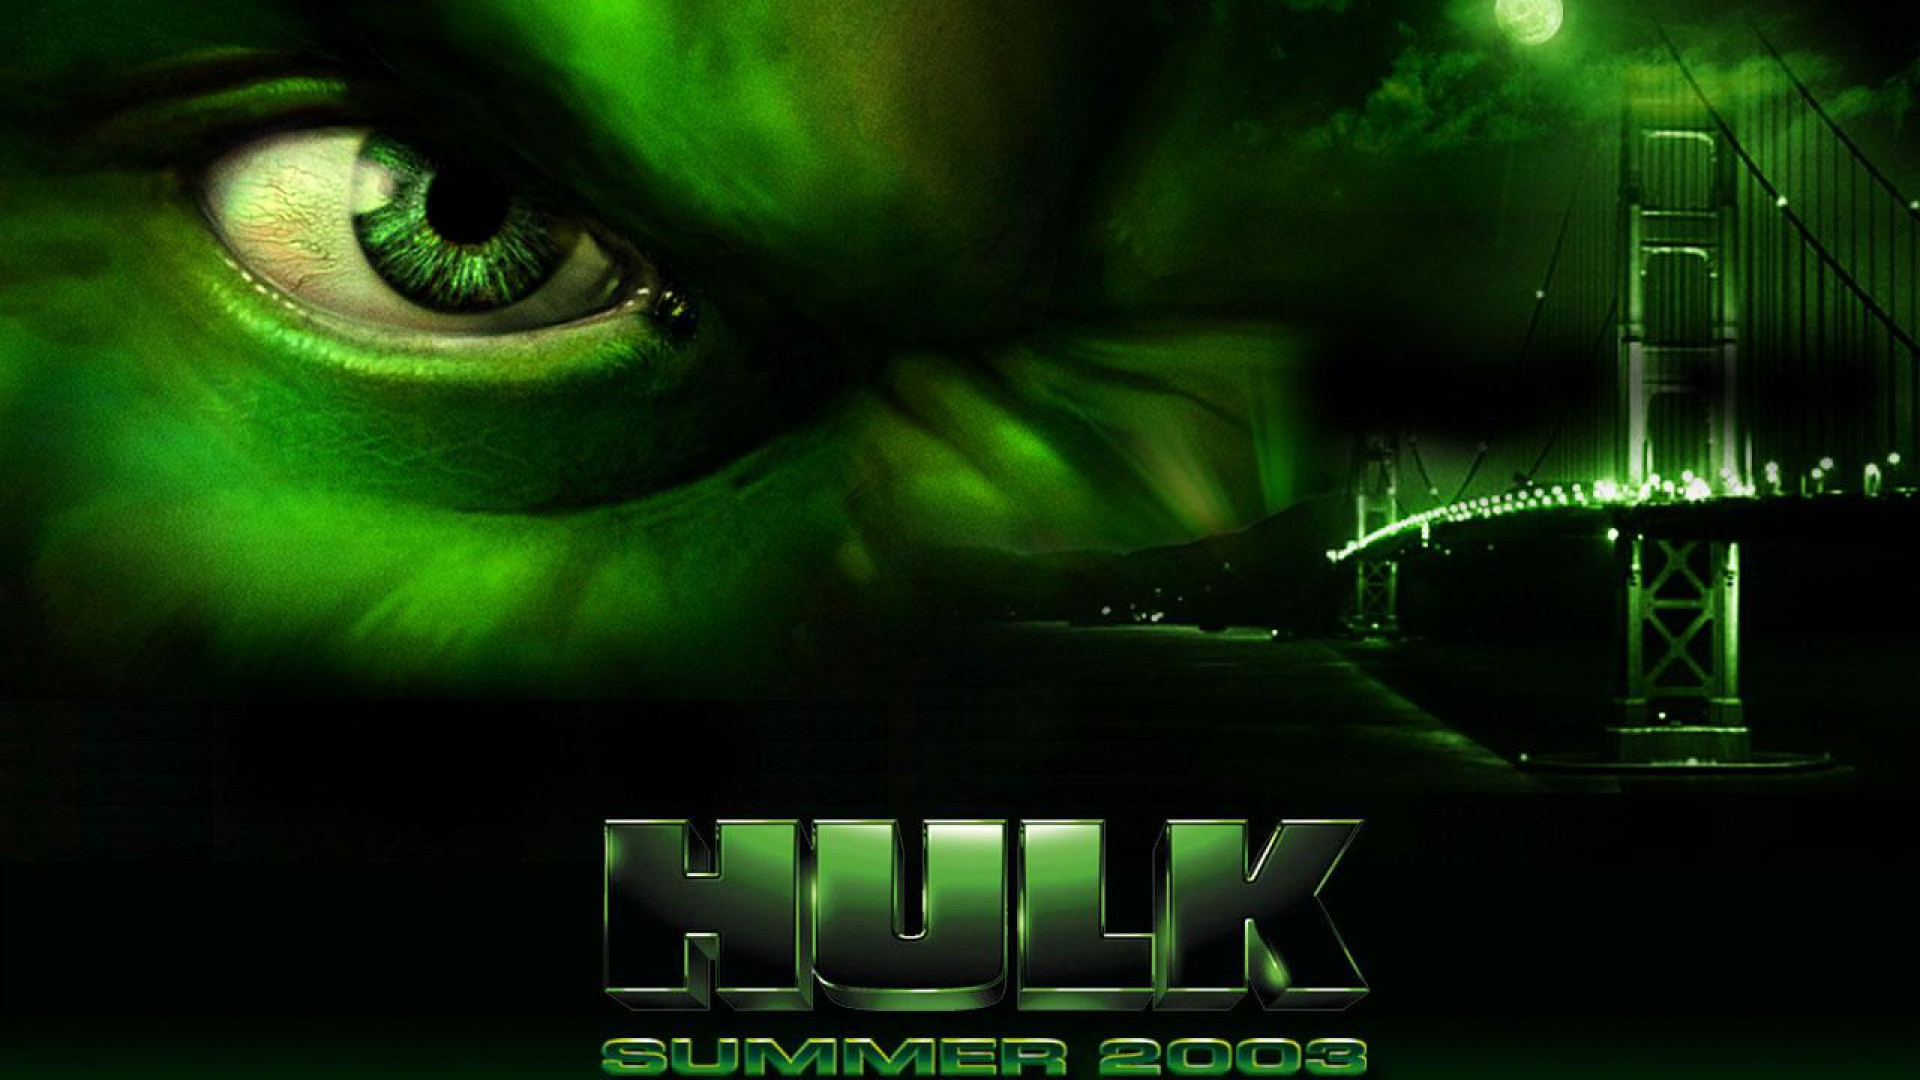 fonds d'écran hulk : tous les wallpapers hulk